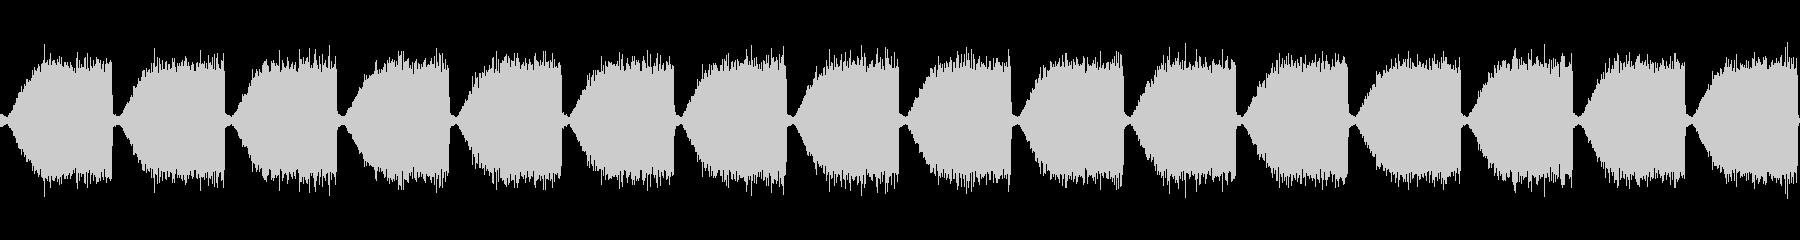 EDMでよくあるホワイトノイズの未再生の波形